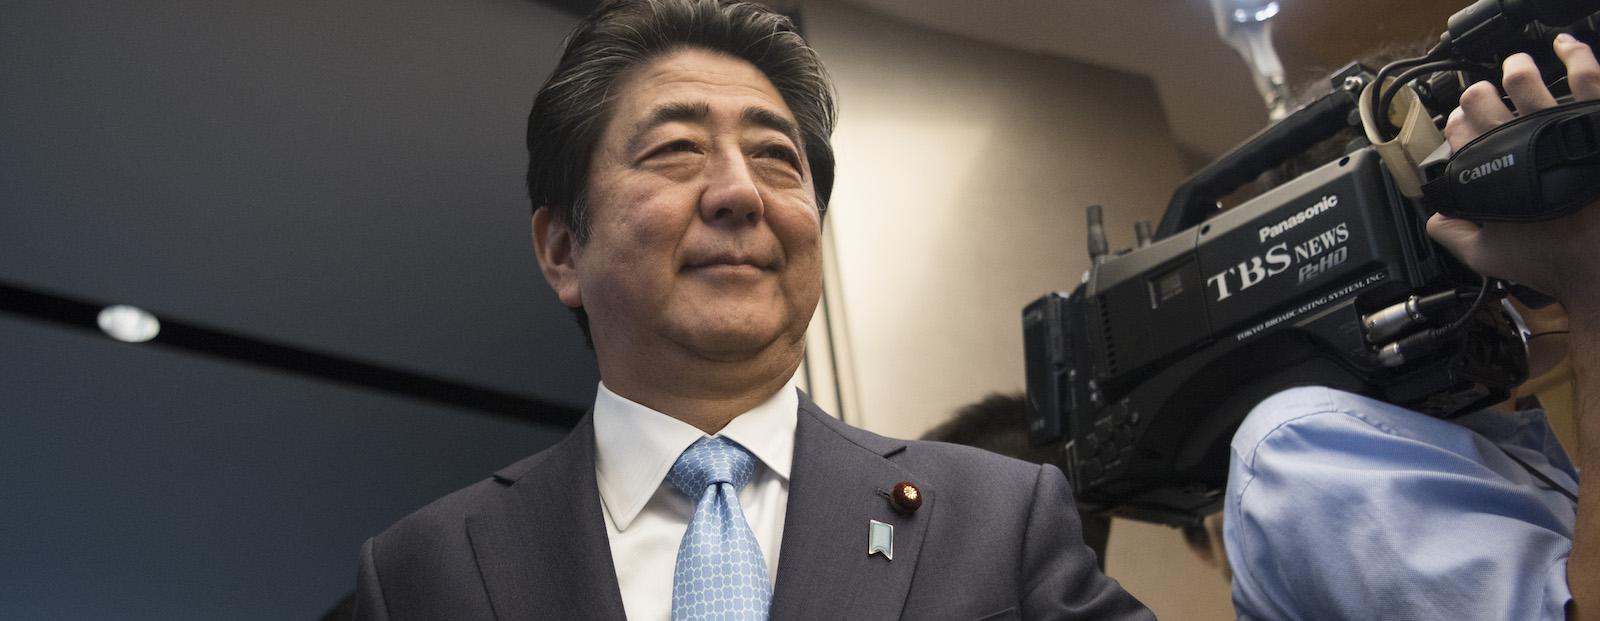 Japanese Prime Minister Shinzo Abe (Photo: CJCS/ Flickr)